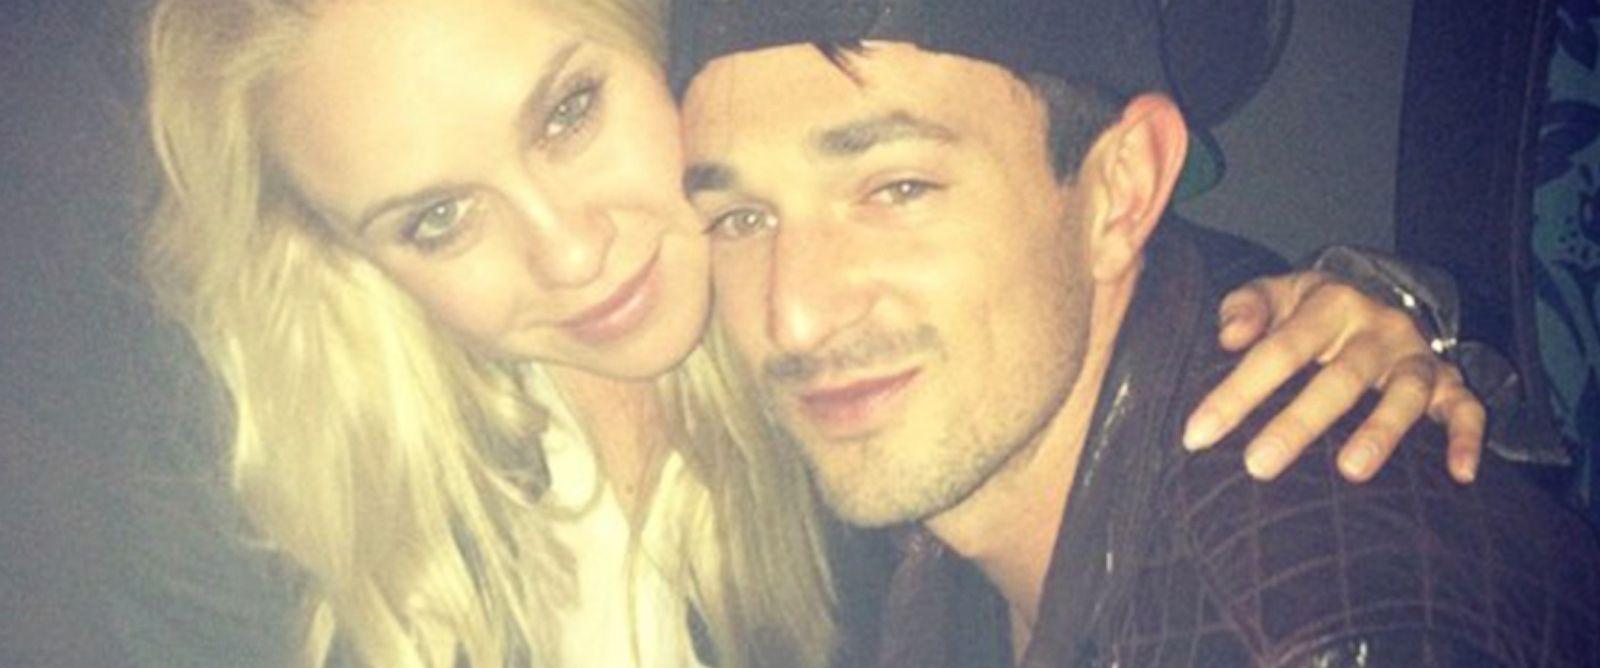 PHOTO: Glee actress Becca Tobin shared this image of herself and boyfriend Matt to her Instagram account, Aug. 3, 2014.